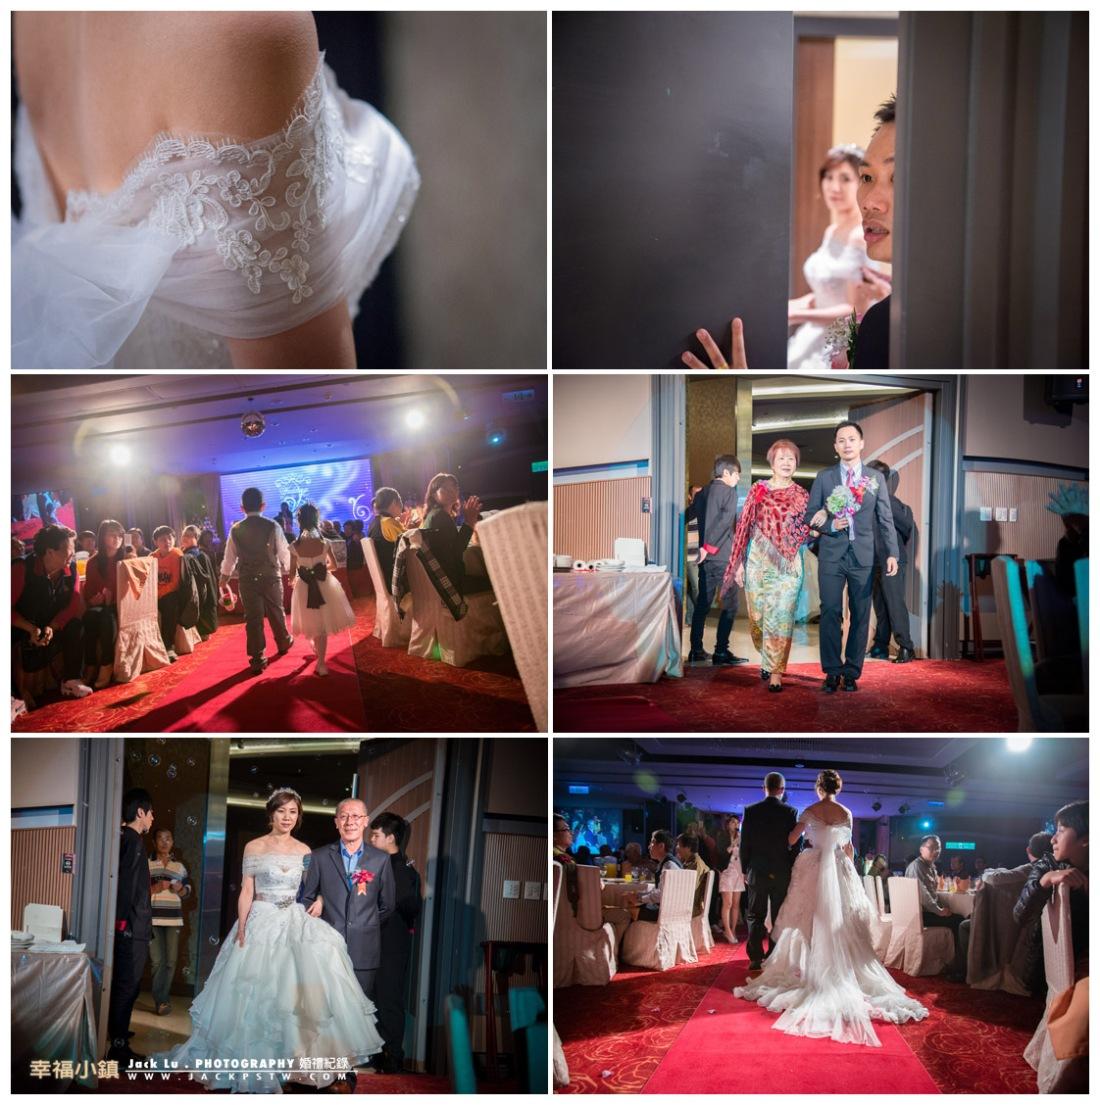 Taiwan-kaohsiung-wedding-ceremony-photography-jan13